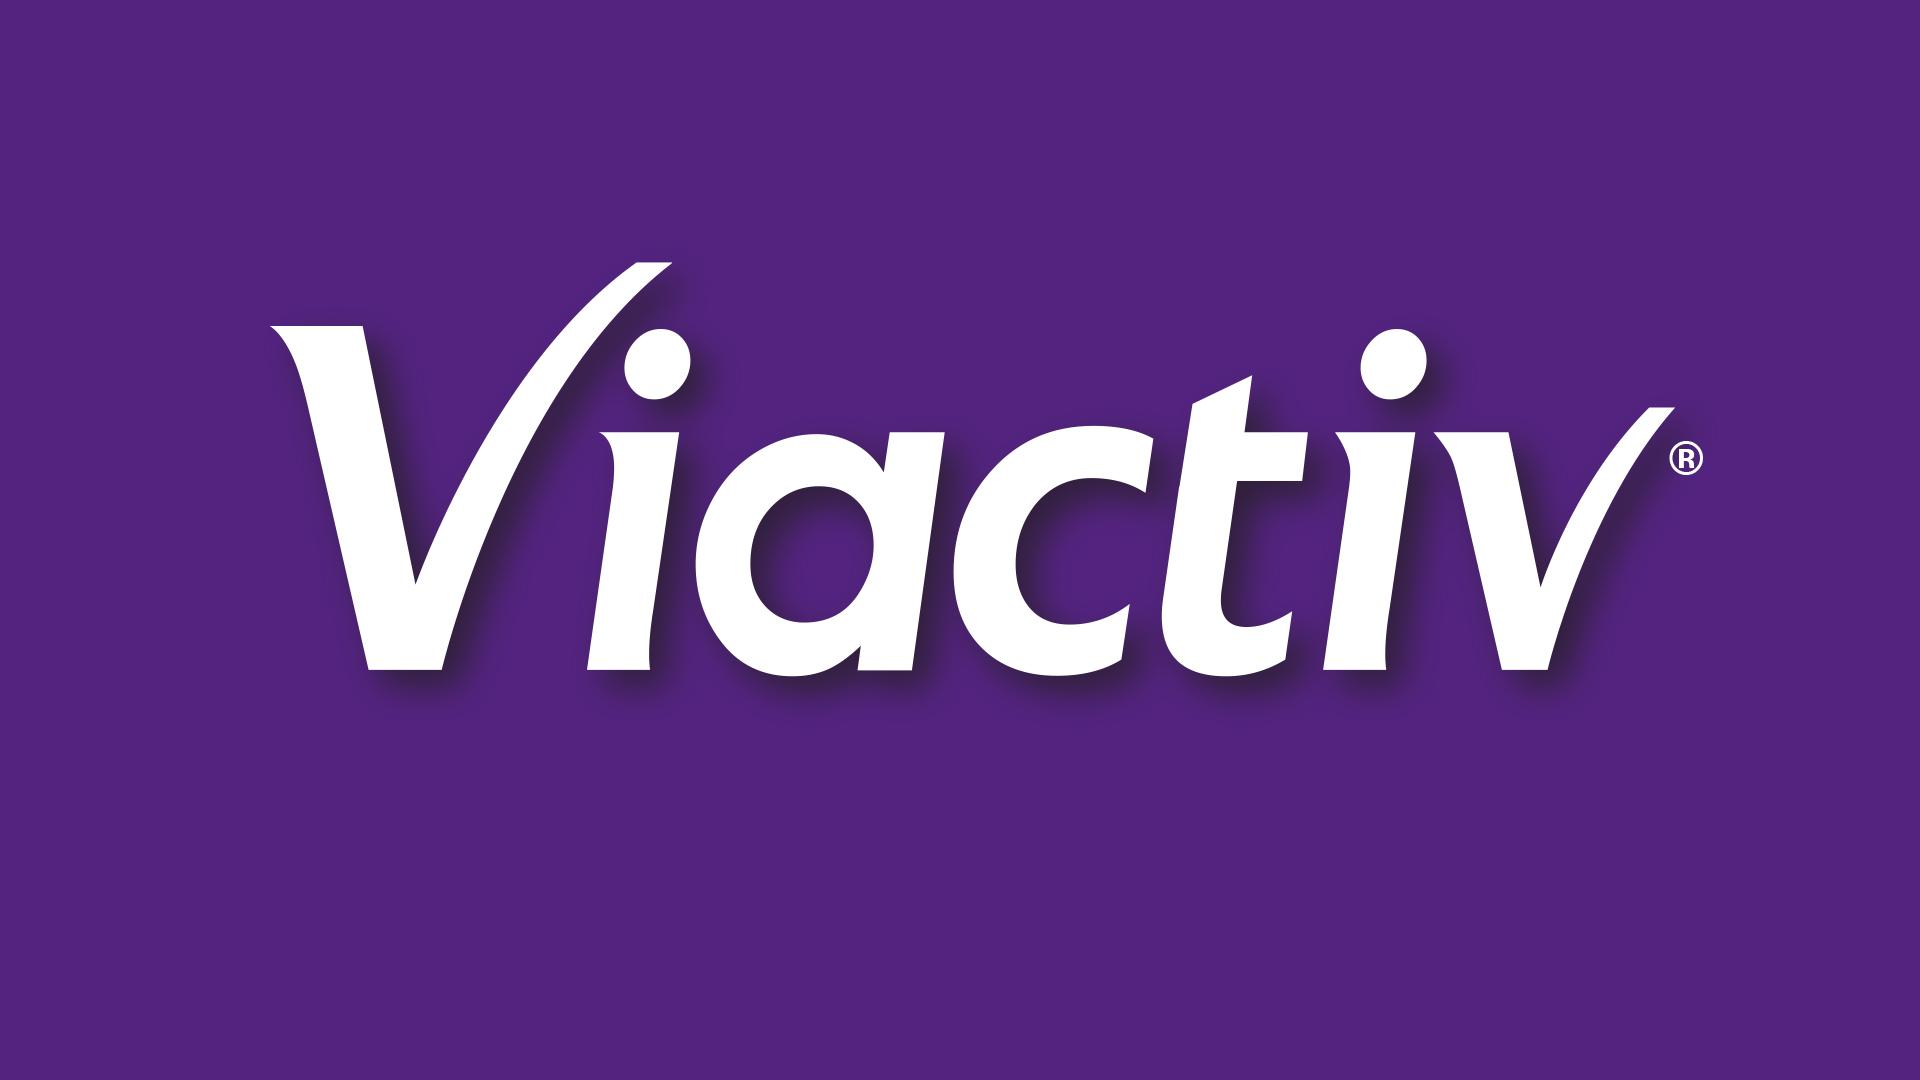 Viactiv | The Best Calcium Supplement